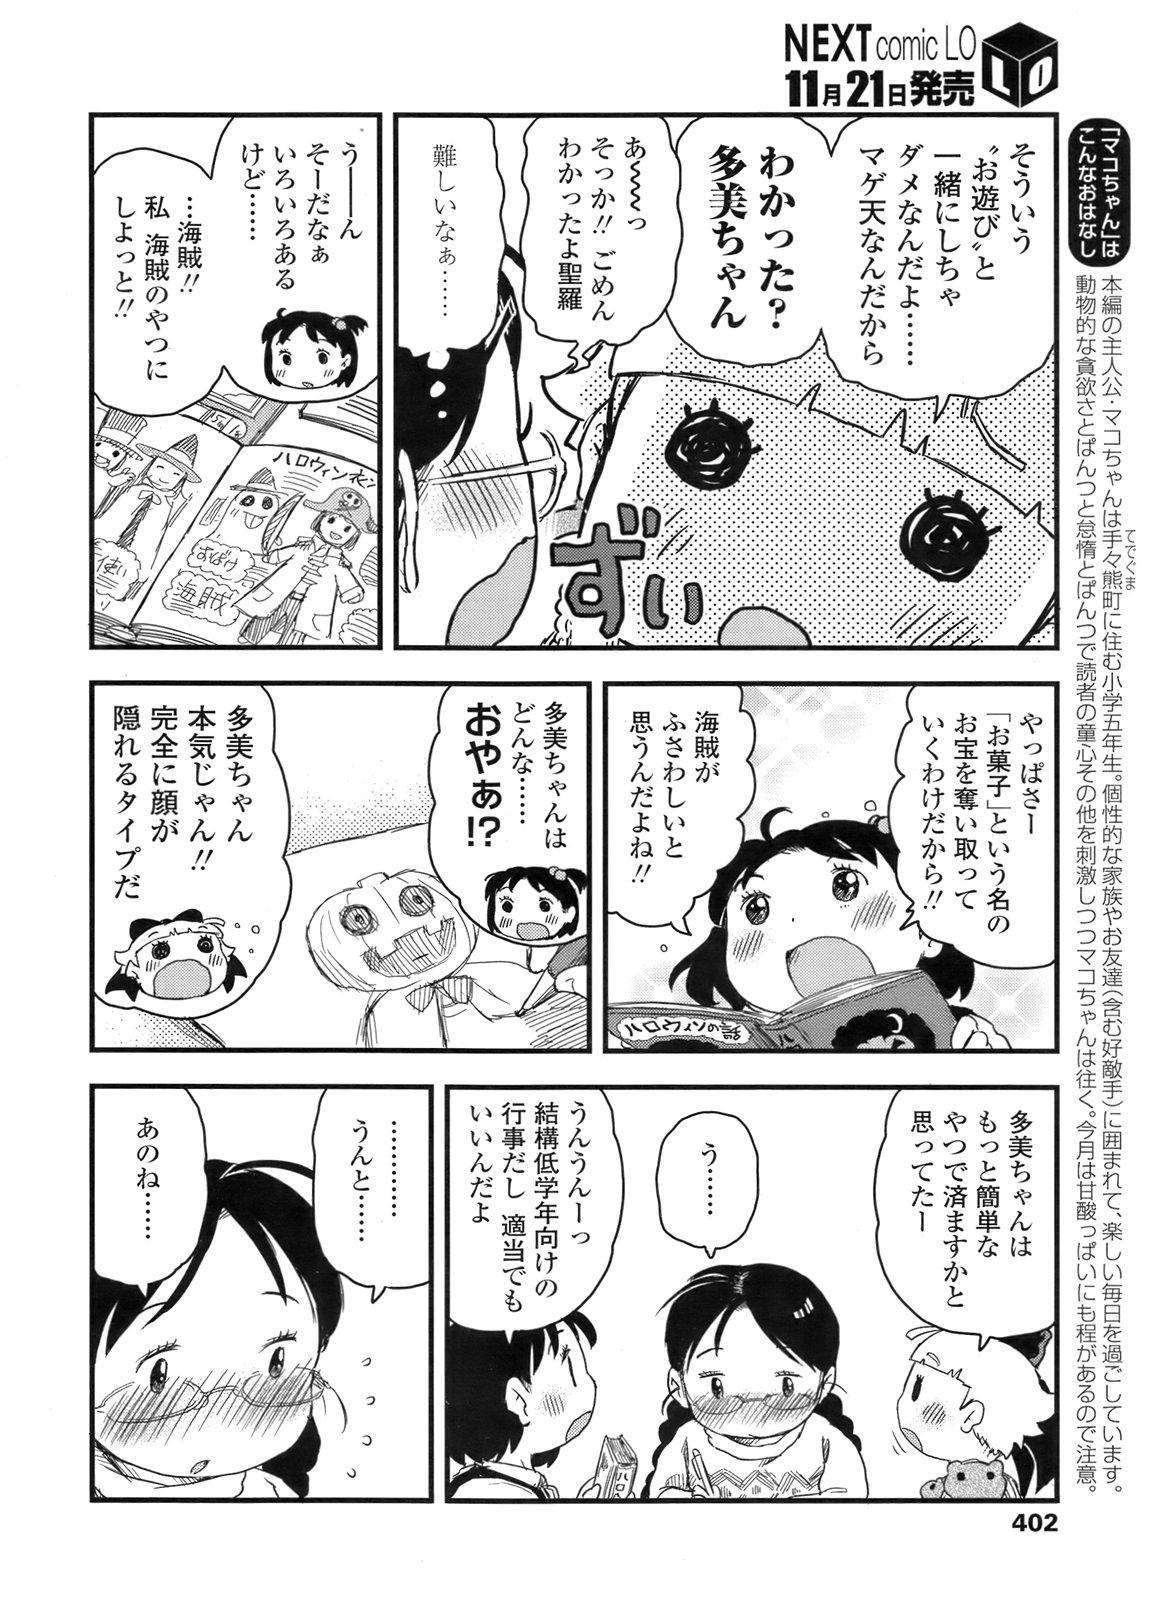 COMIC LO 2011-12 Vol. 93 402